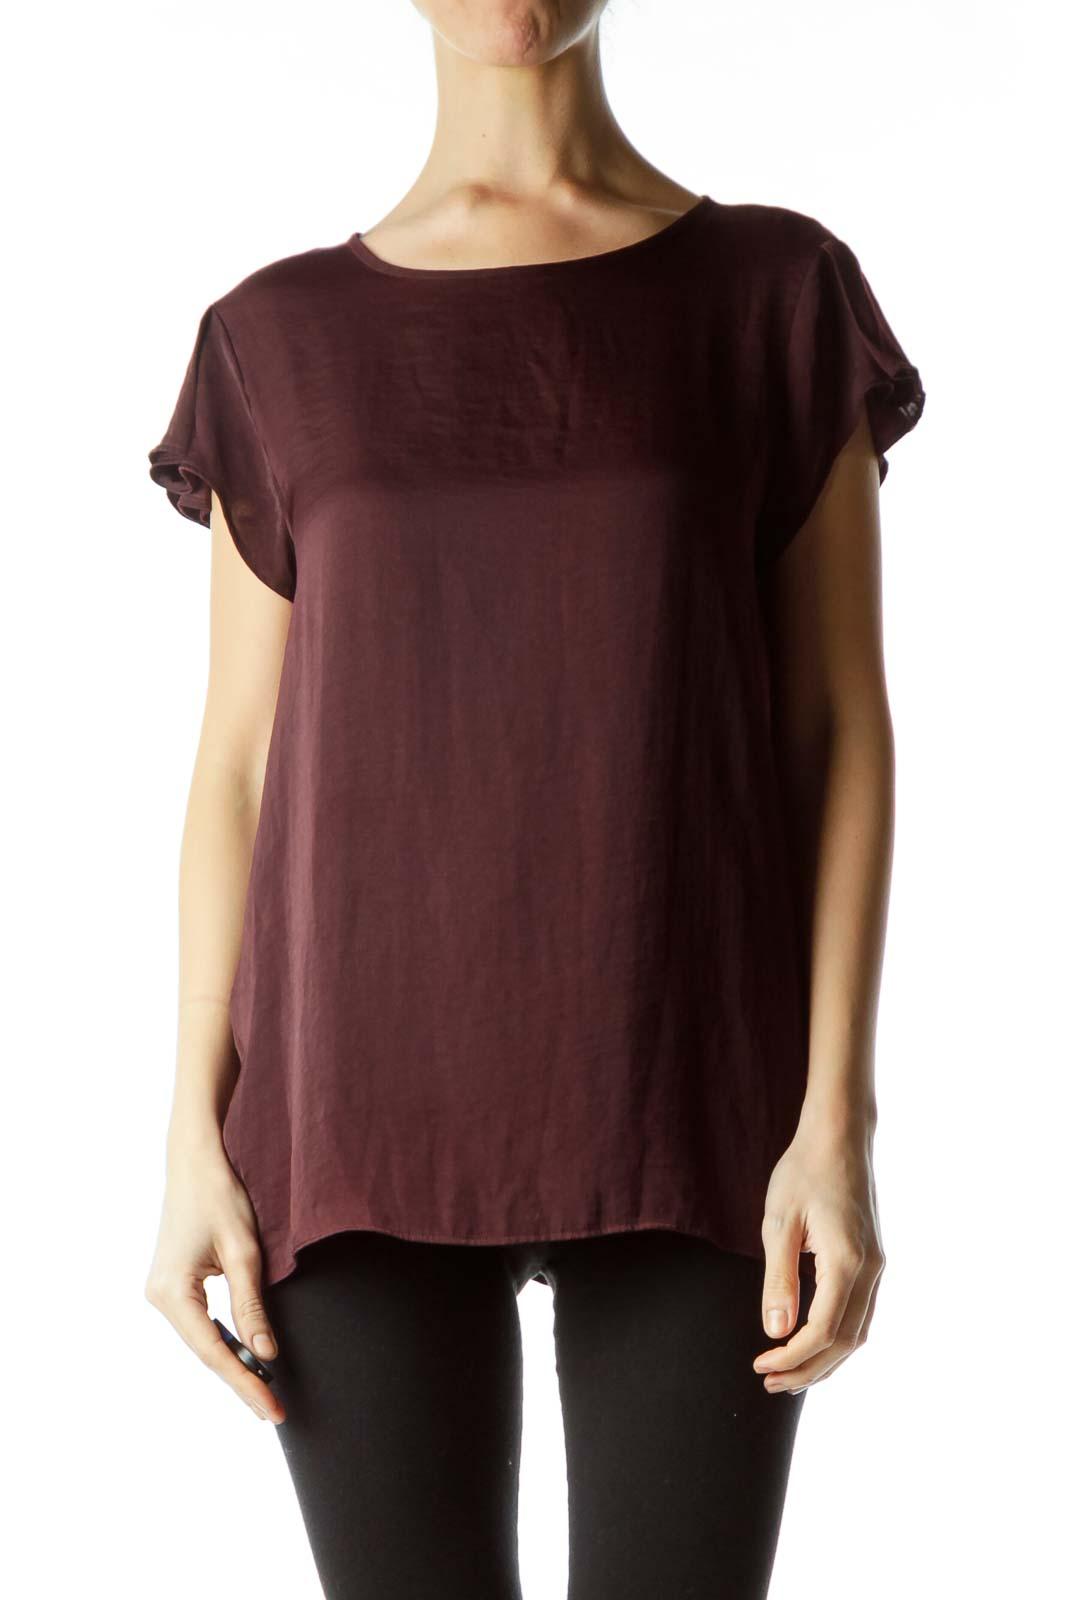 Burgundy Round Neck Short Sleeve Blouse